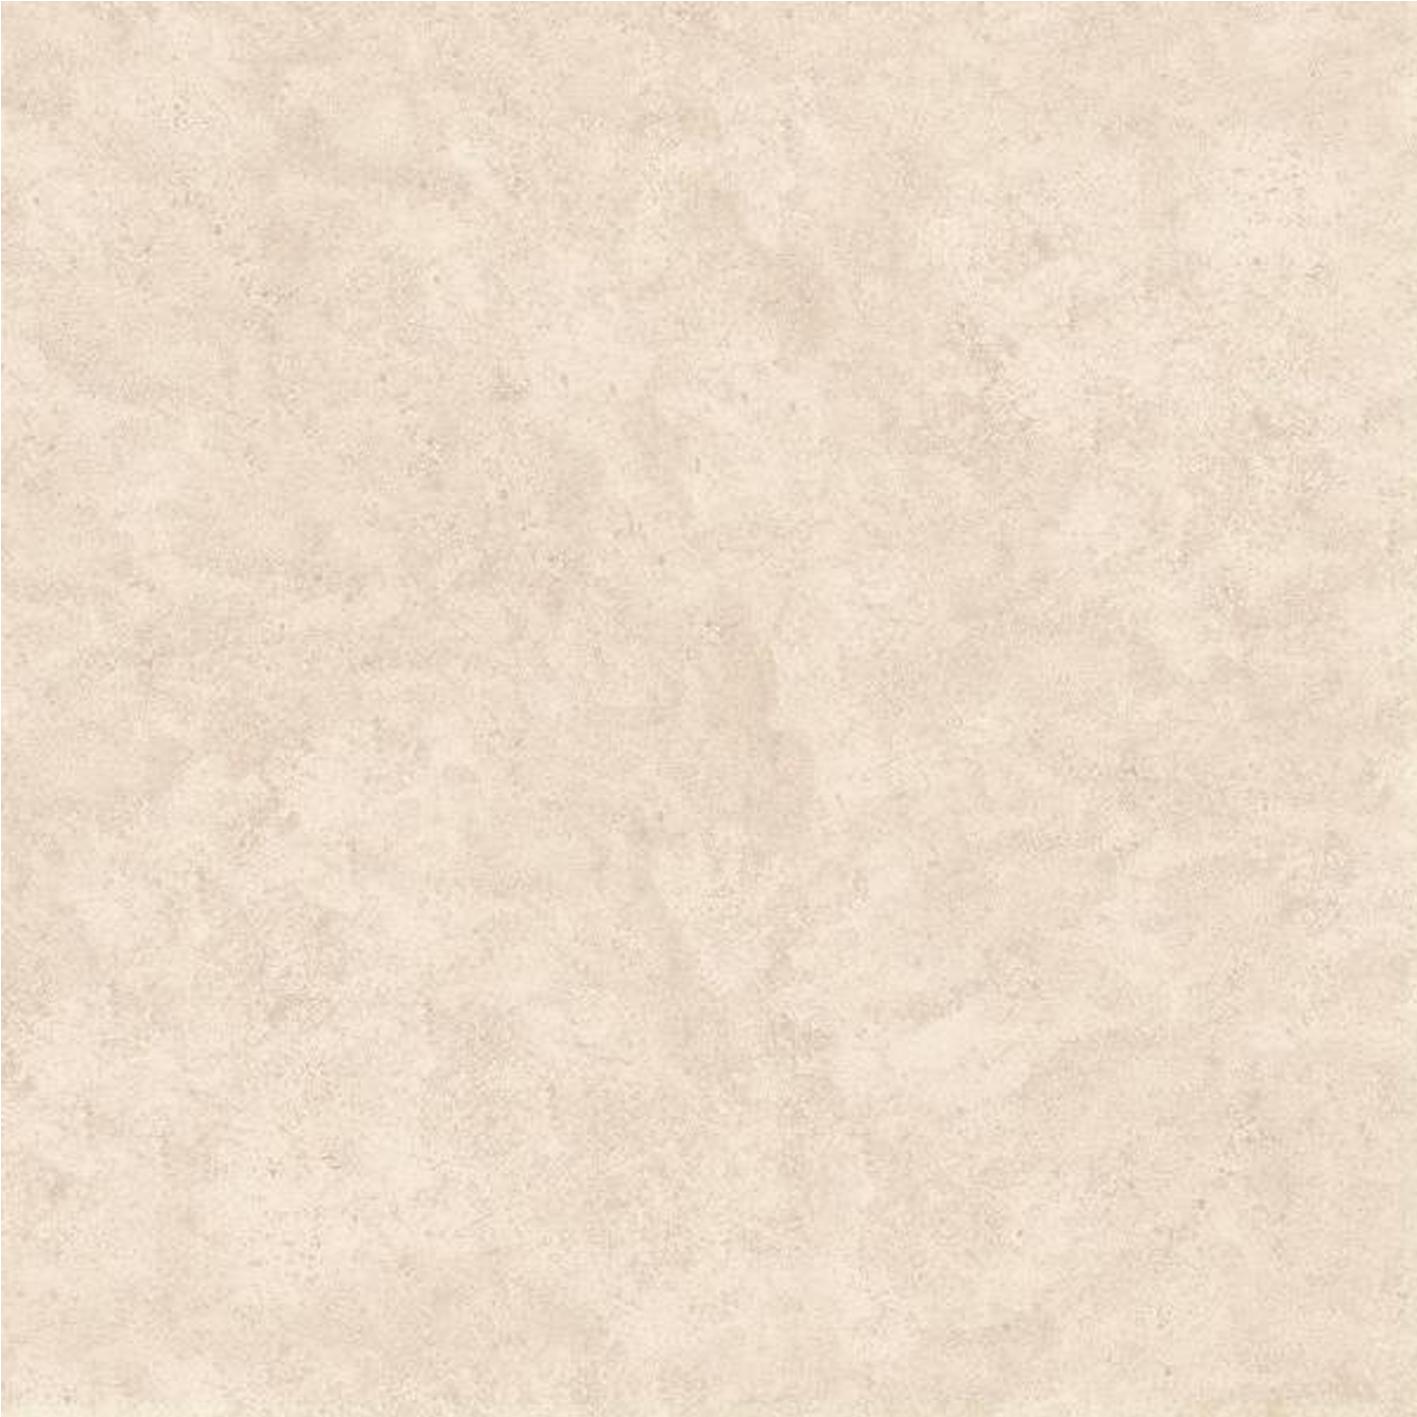 Eylül Bone Yer Karosu 45x45 1 Paket / 1.62m²